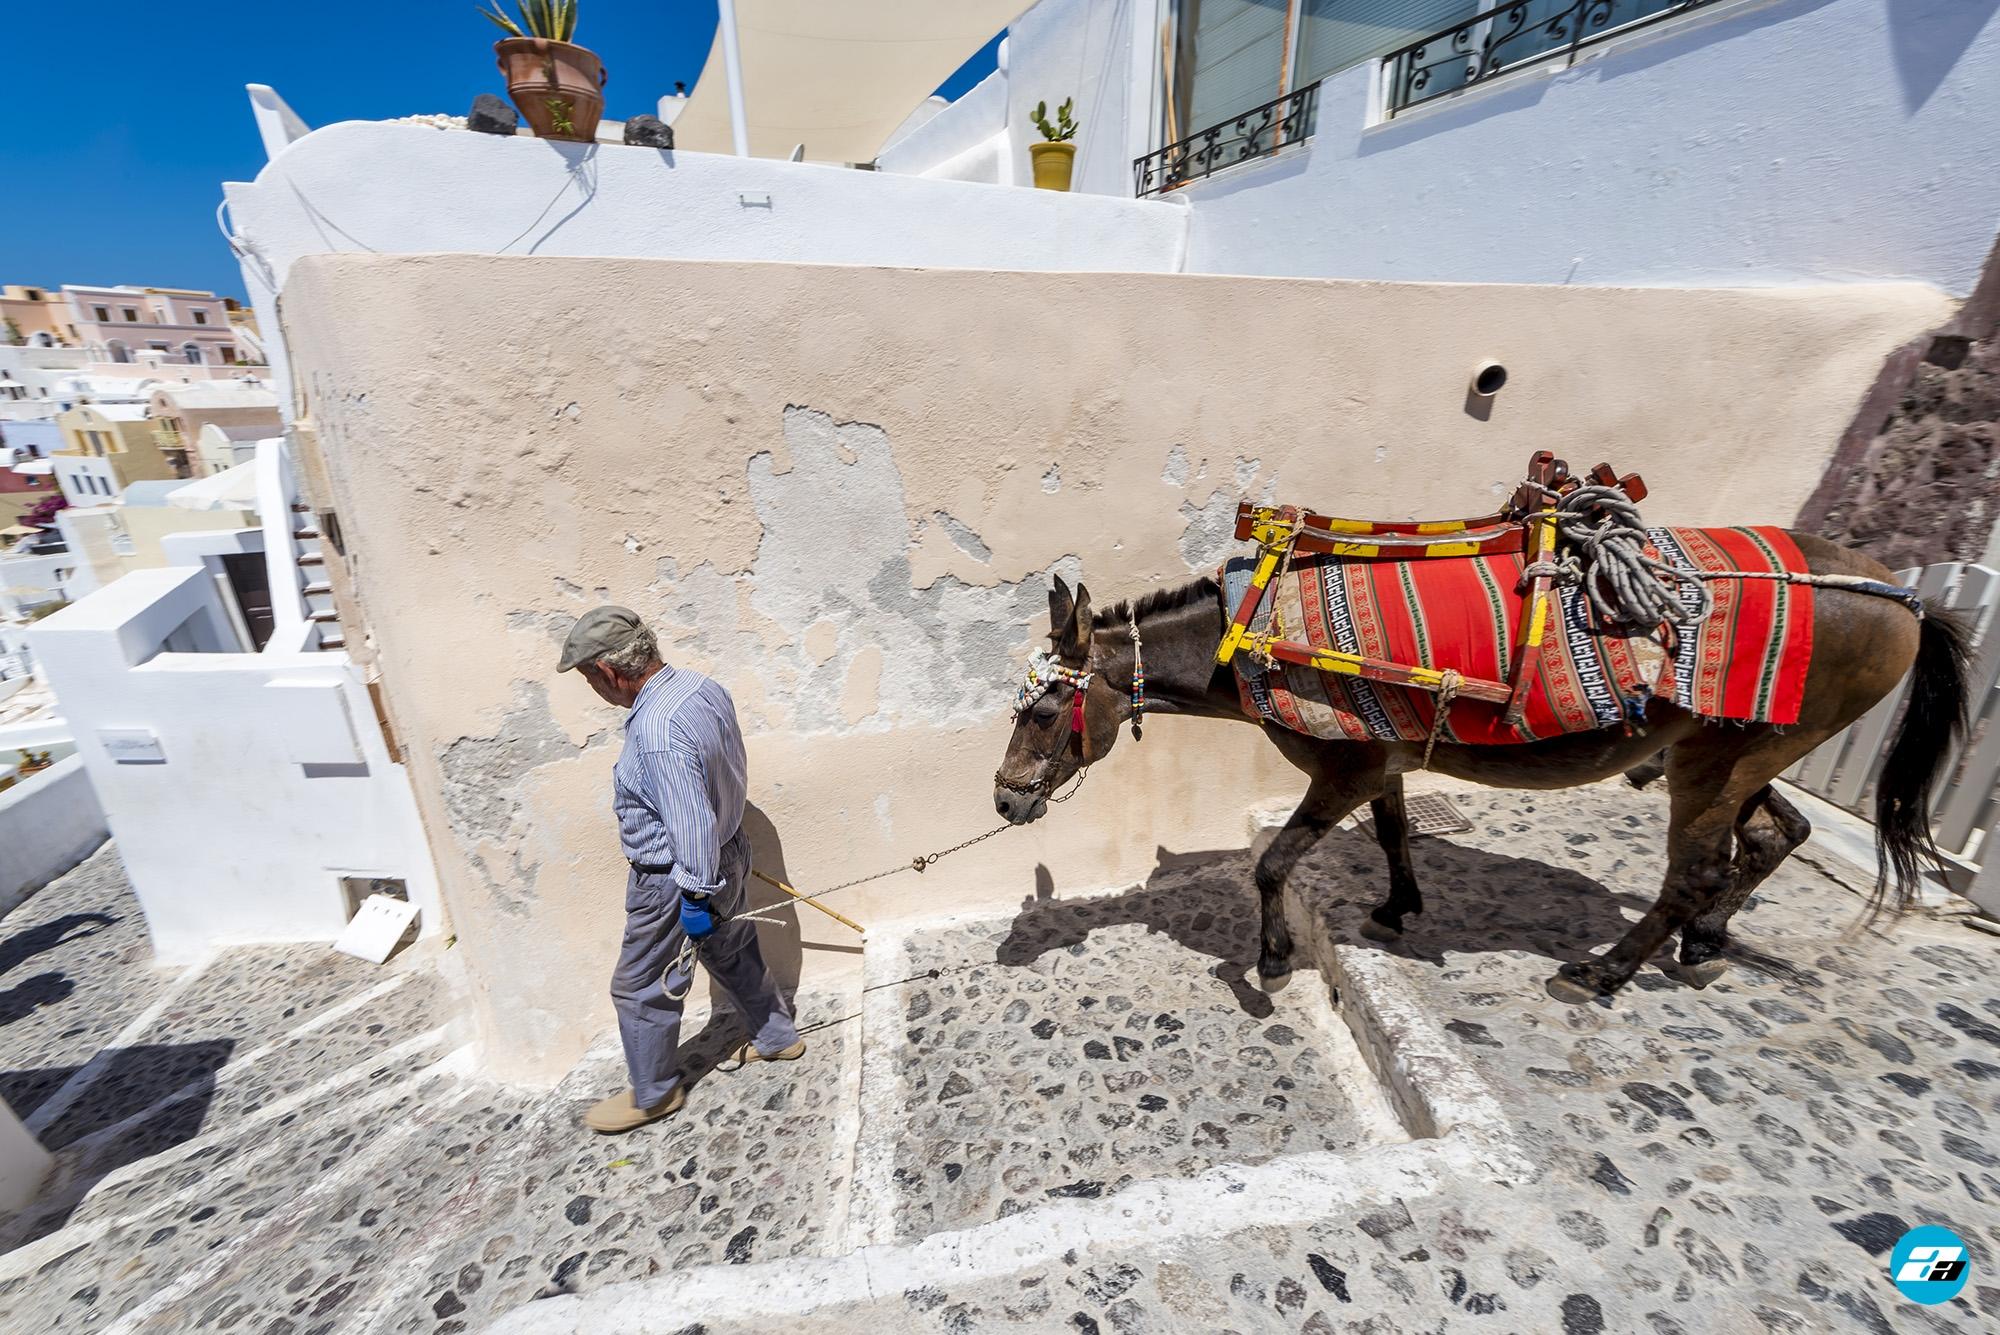 Oia, Santorini Greece. Mules. Santorni transportation.